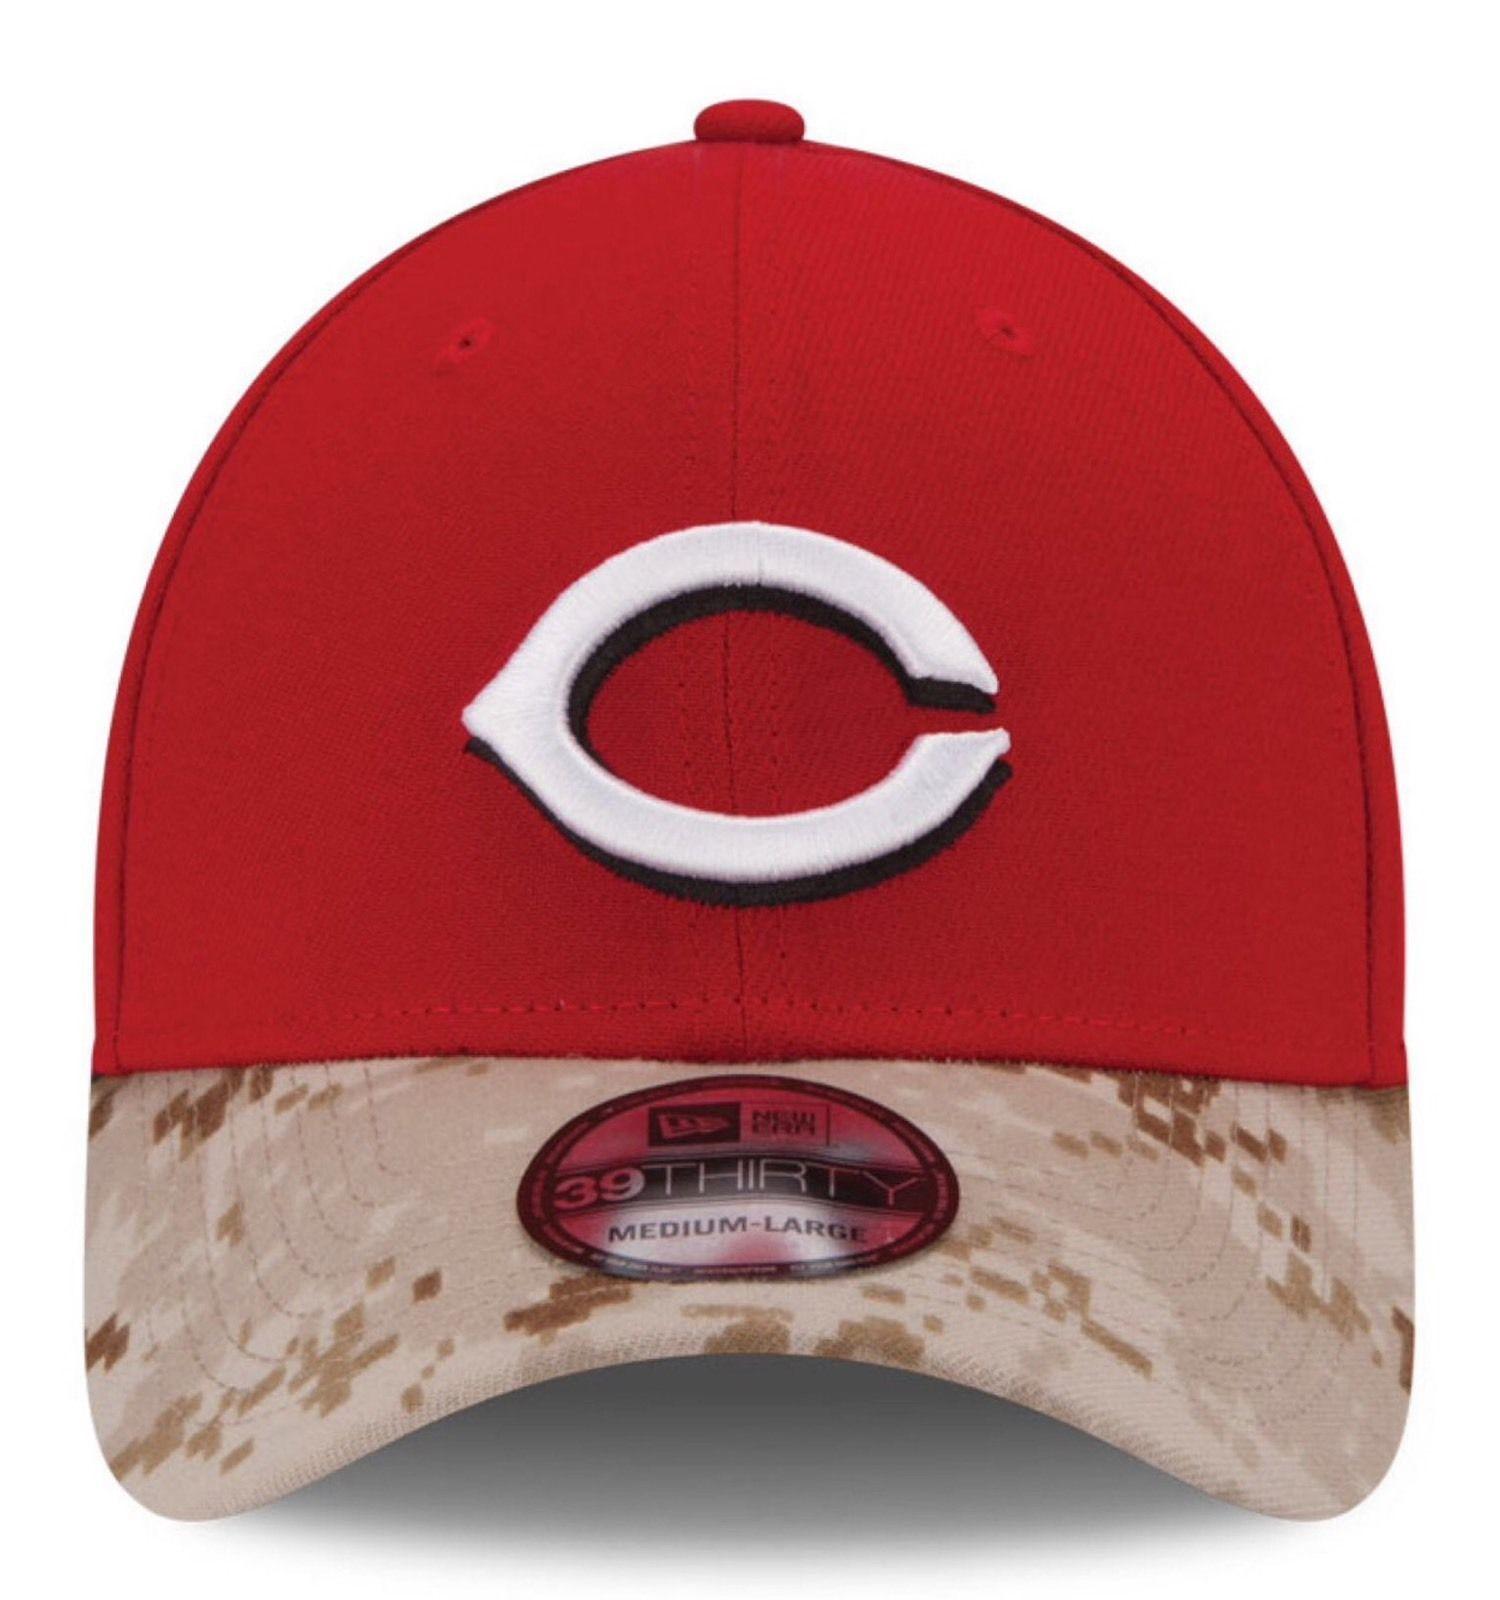 31d3b2e9284 Cincinnati Reds New Era 39Thirty Memorial Day Flexfit Fitted M L Cap Hat